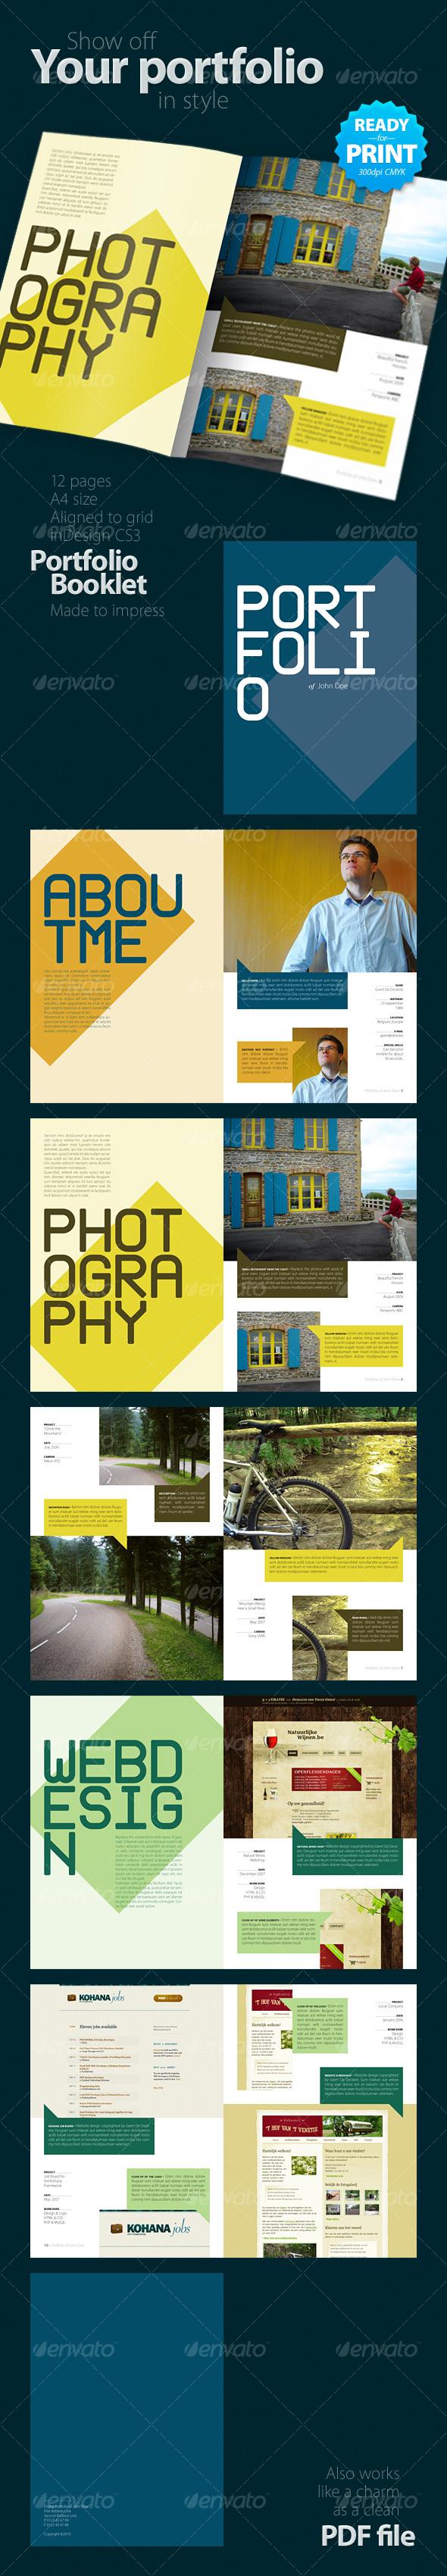 Portfolio Booklet (12 pages)